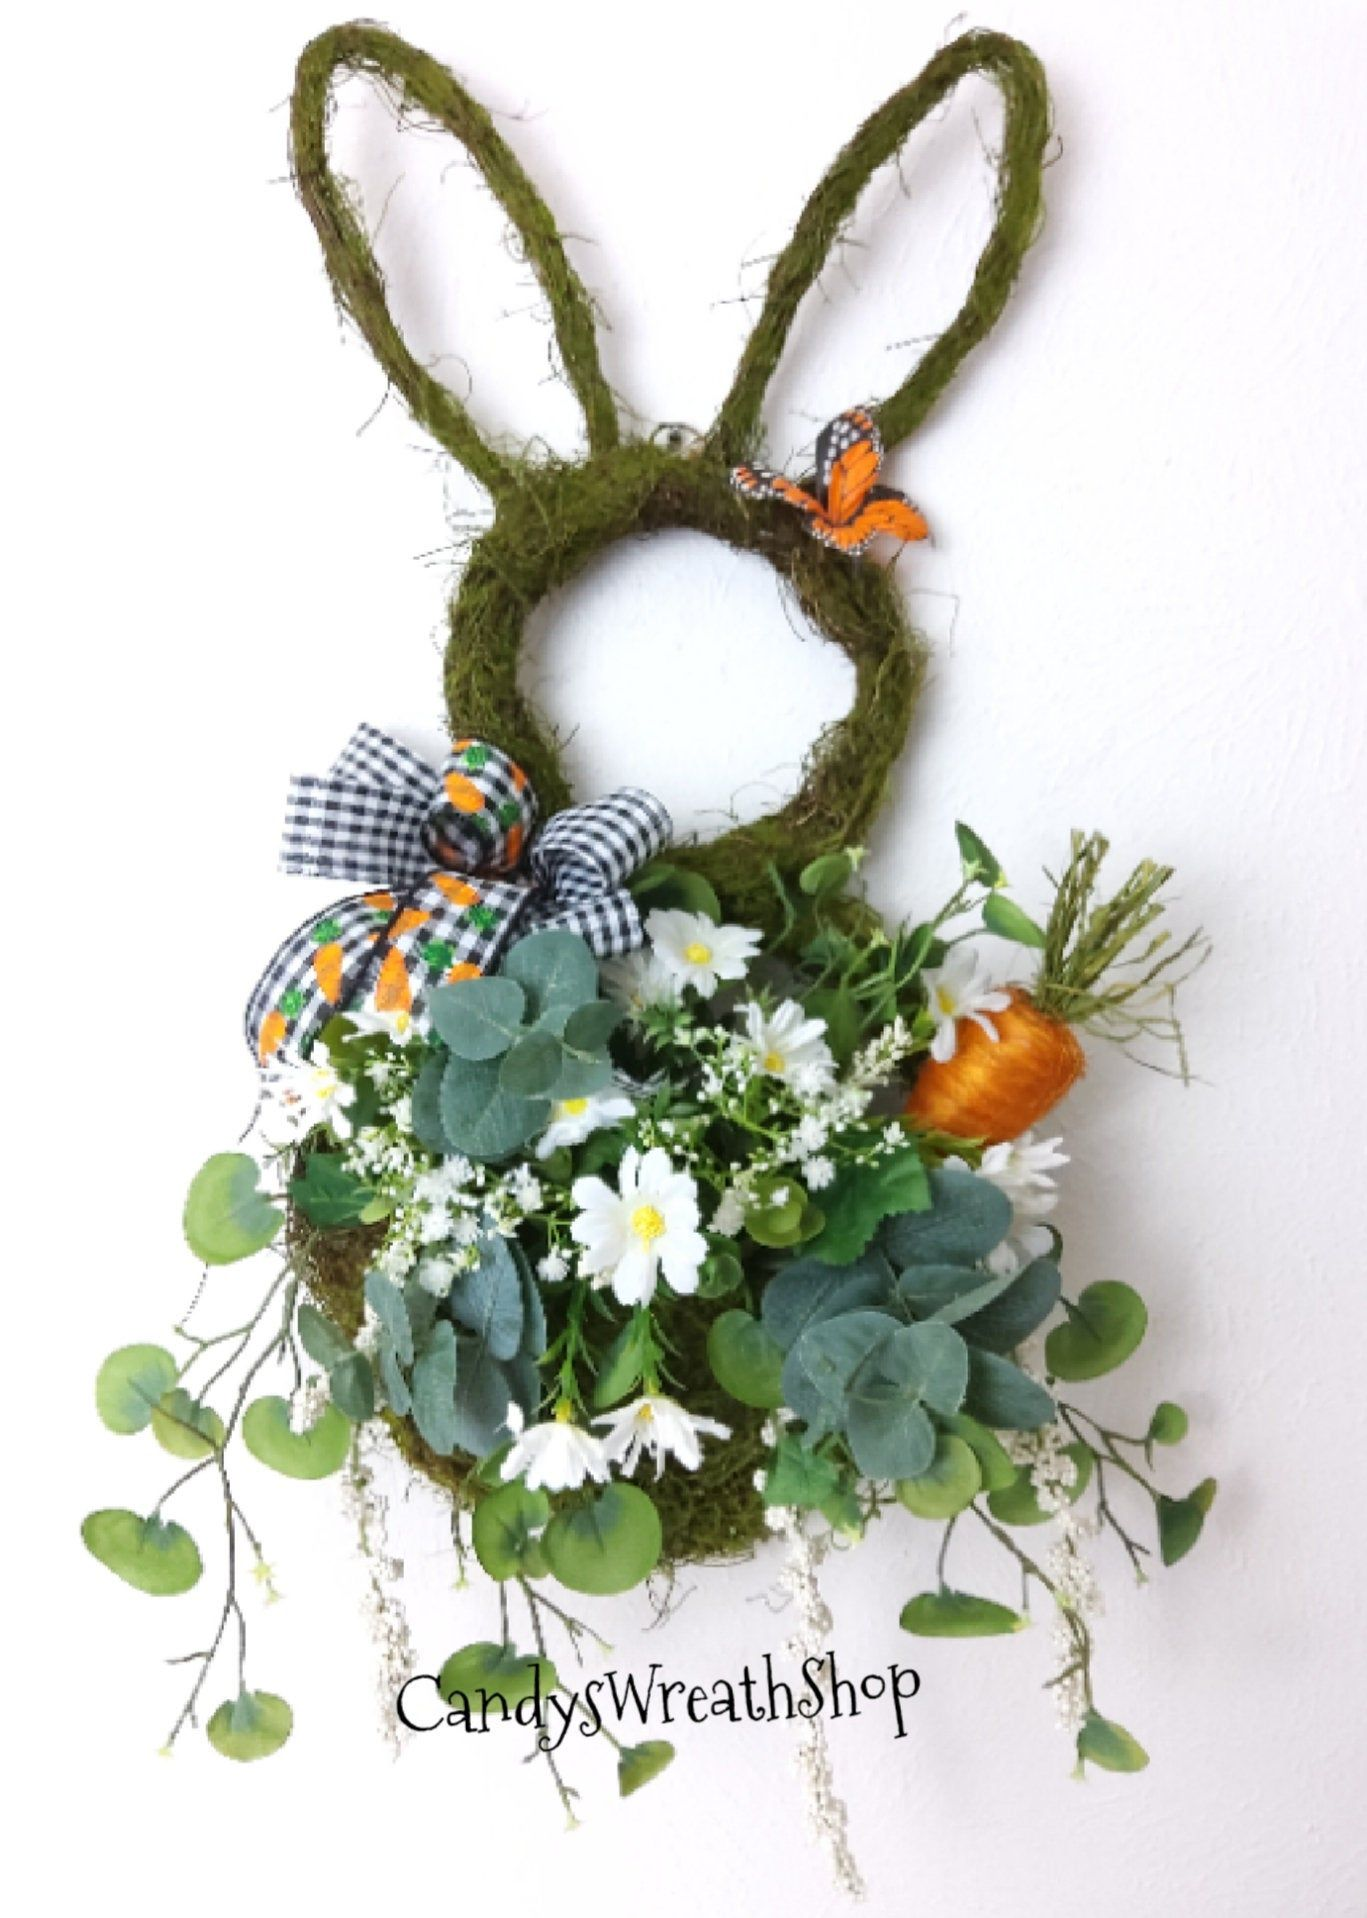 Photo of Easter Wreath, Bunny Wreath, Bunny Grapevine, Easter Decor, Floral Bunny Wreath, Easter Bunny, Rabbit Wreath, Easter Floral Grapevine